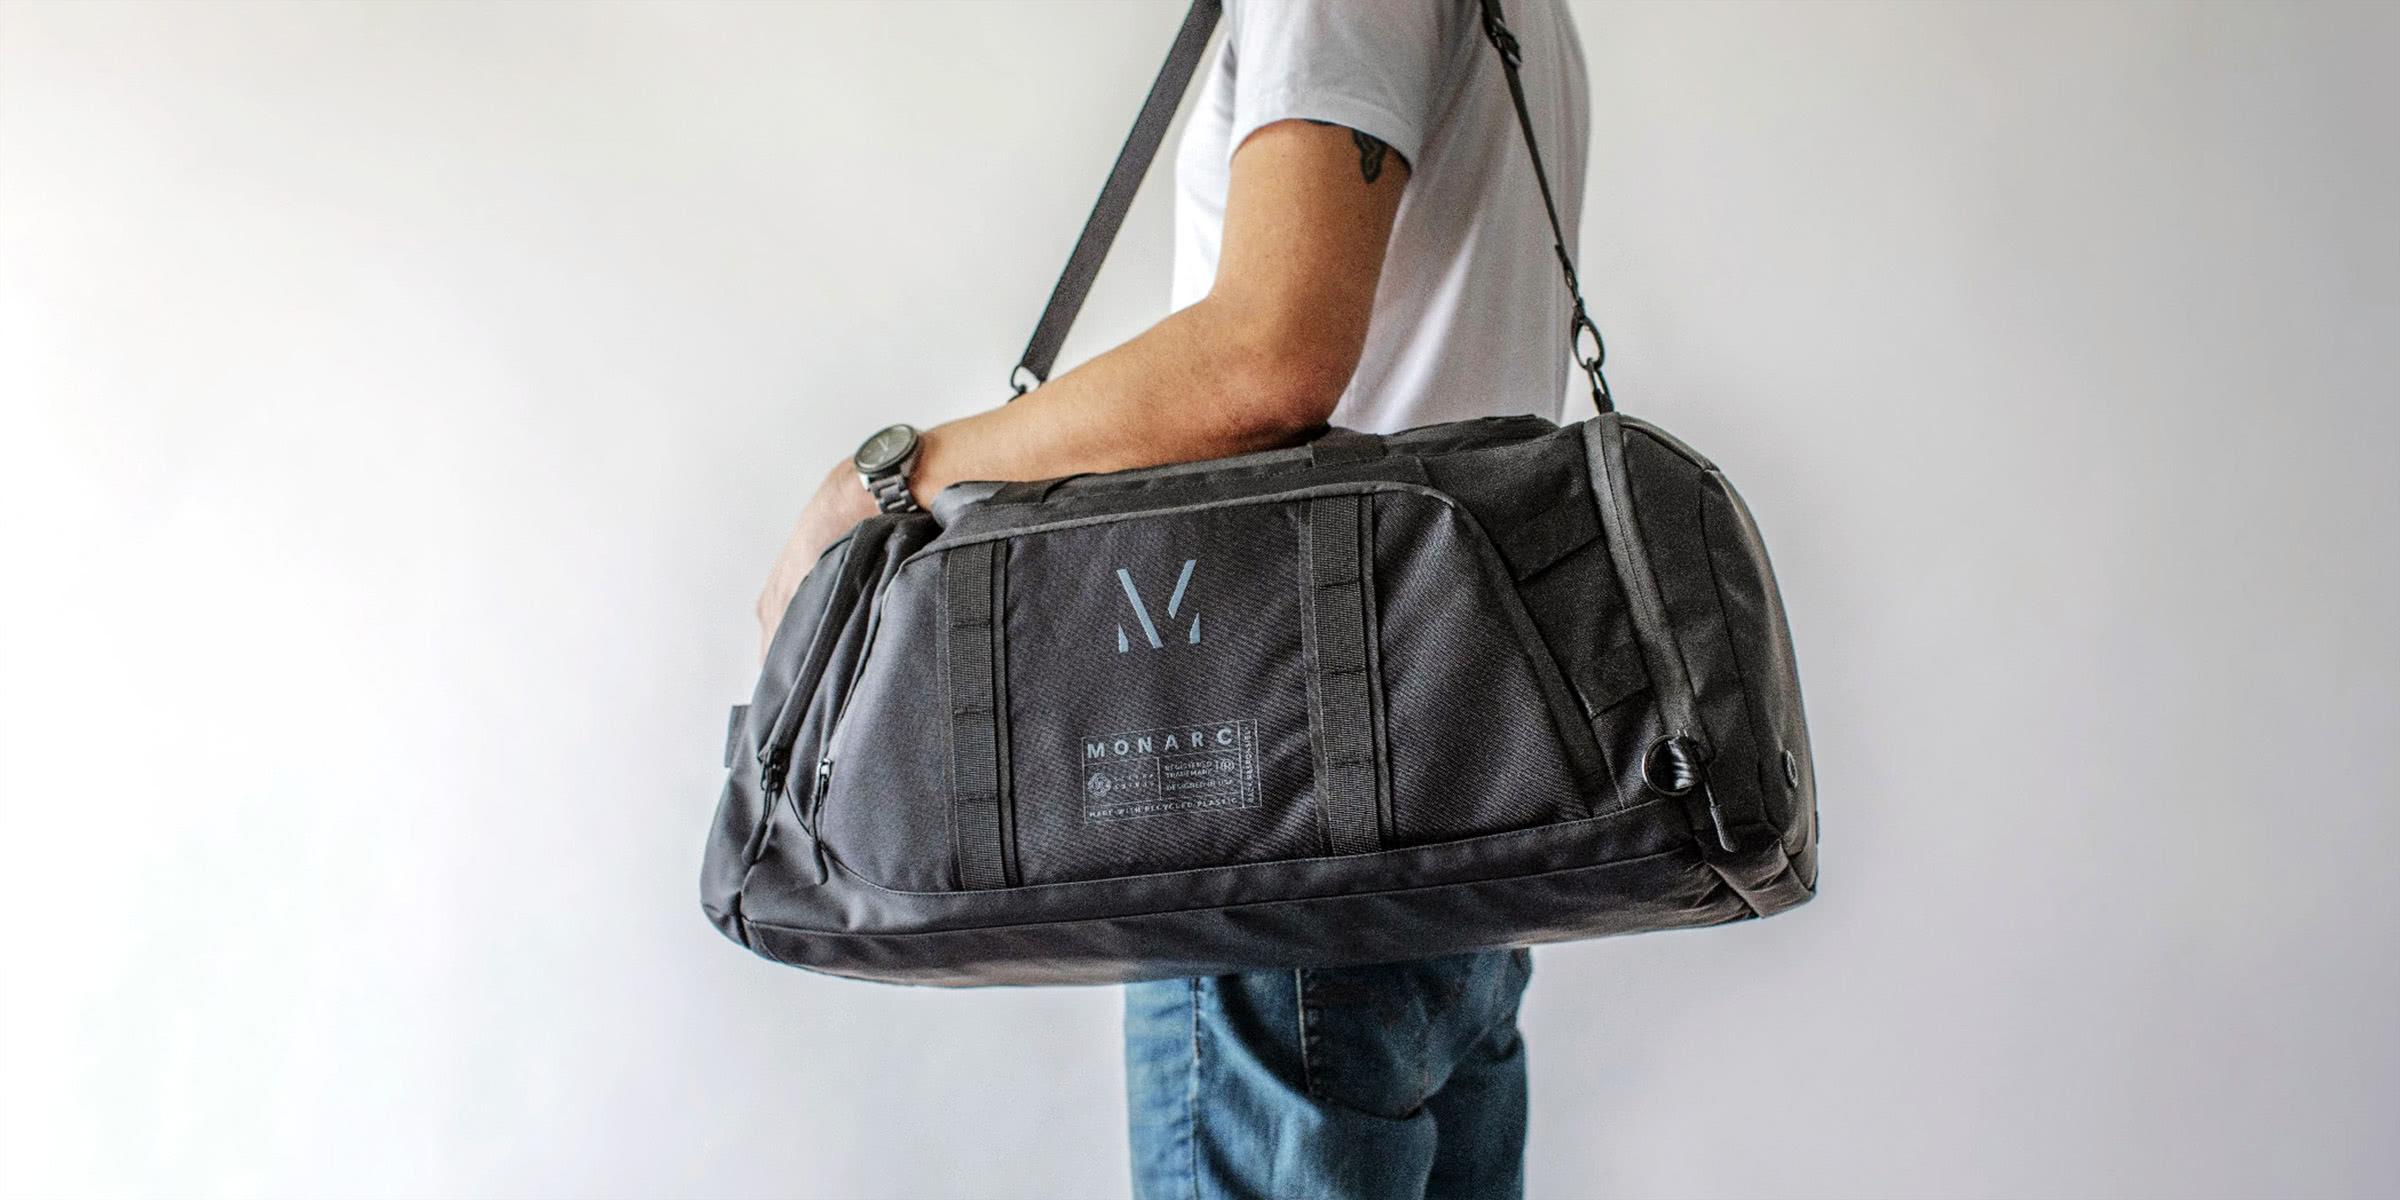 best men gym bags review - Luxe Digital